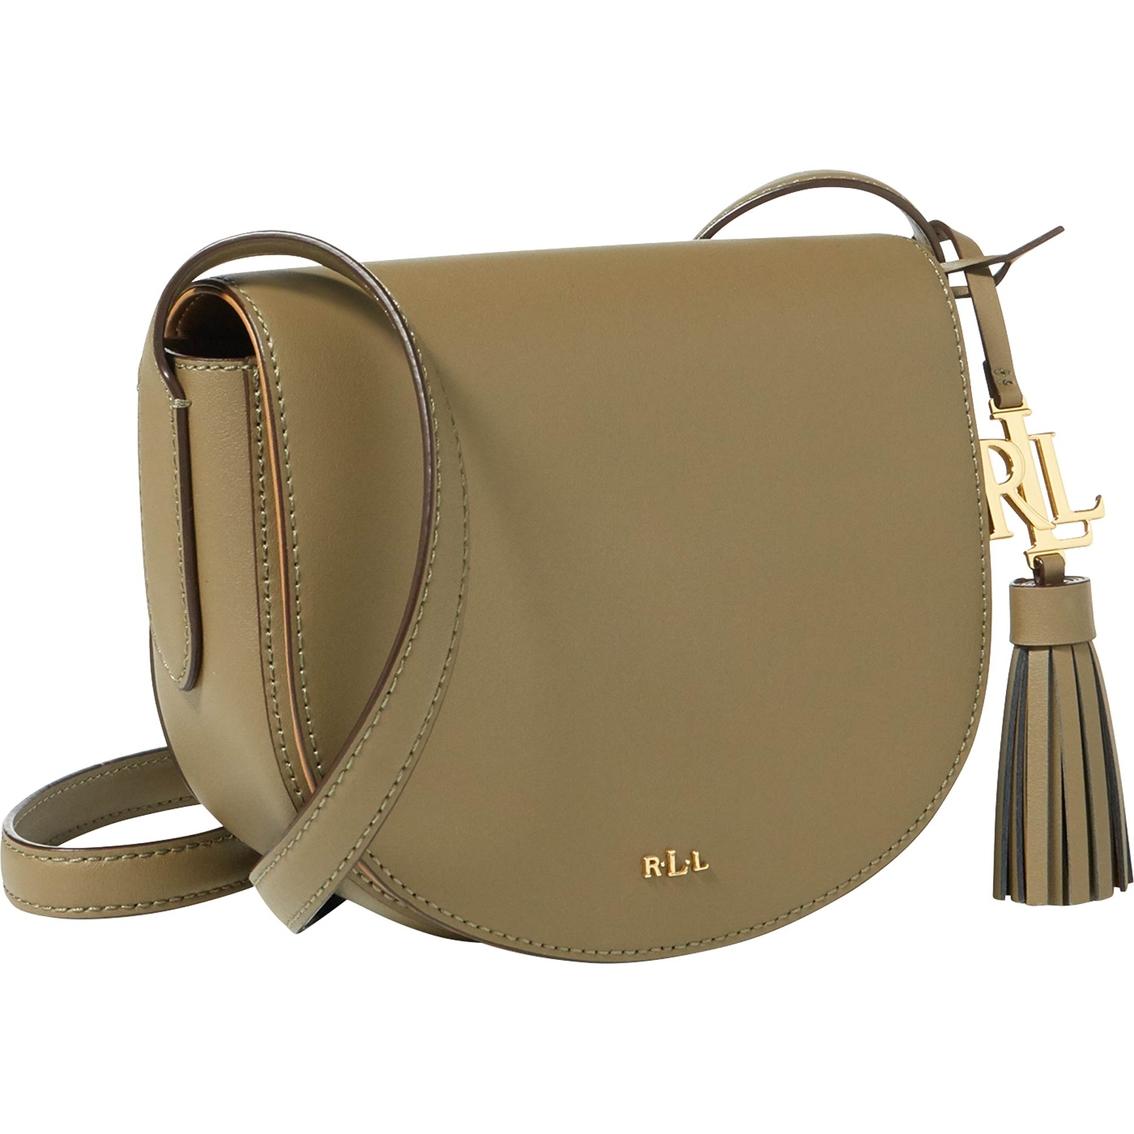 0f16d6e1fa Lauren Ralph Lauren Dryden Caley Saddle Bag Handbag